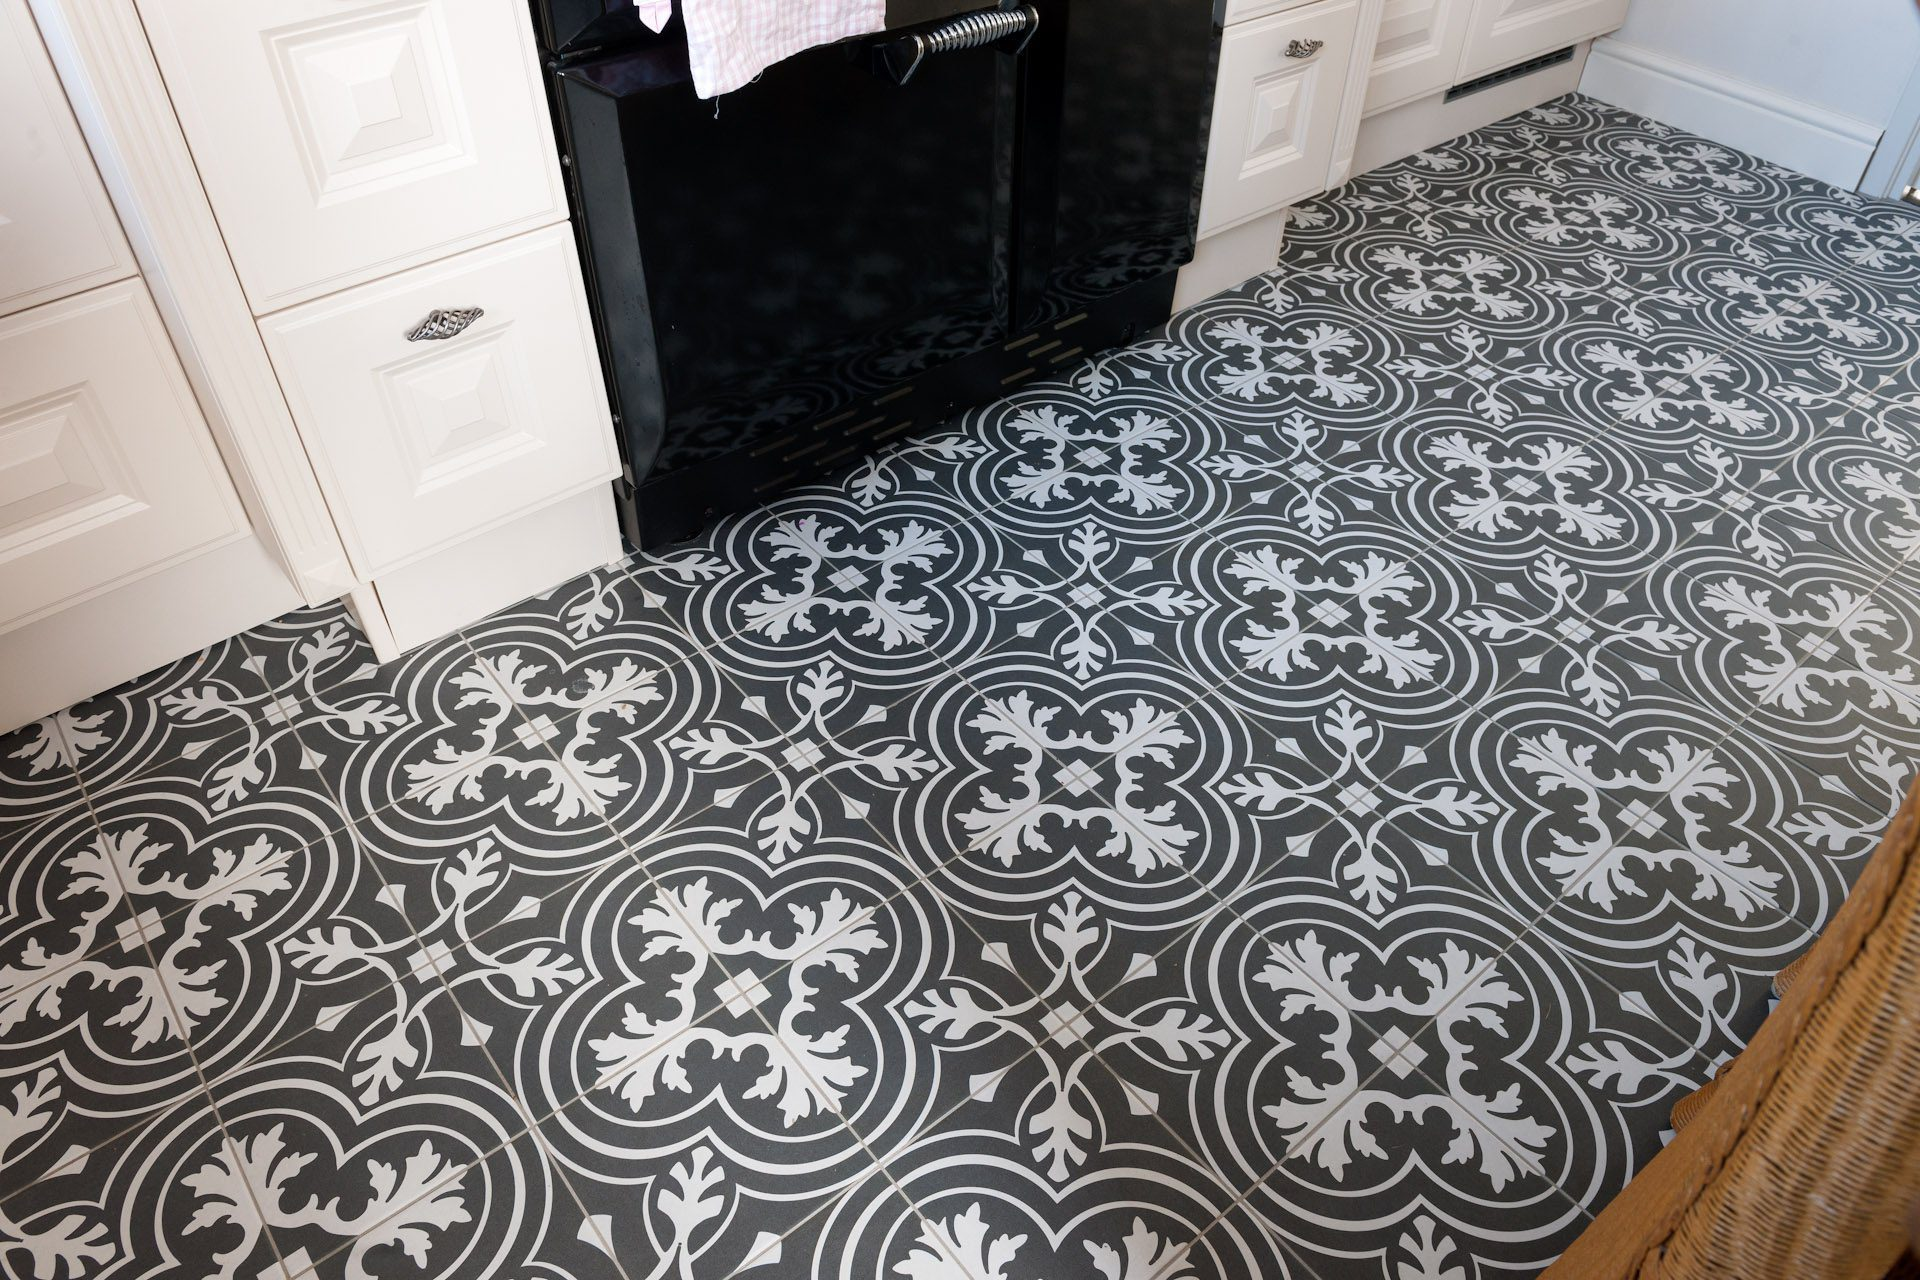 Houtlook vloer in woonkamer, donkere patroontegels in keuken